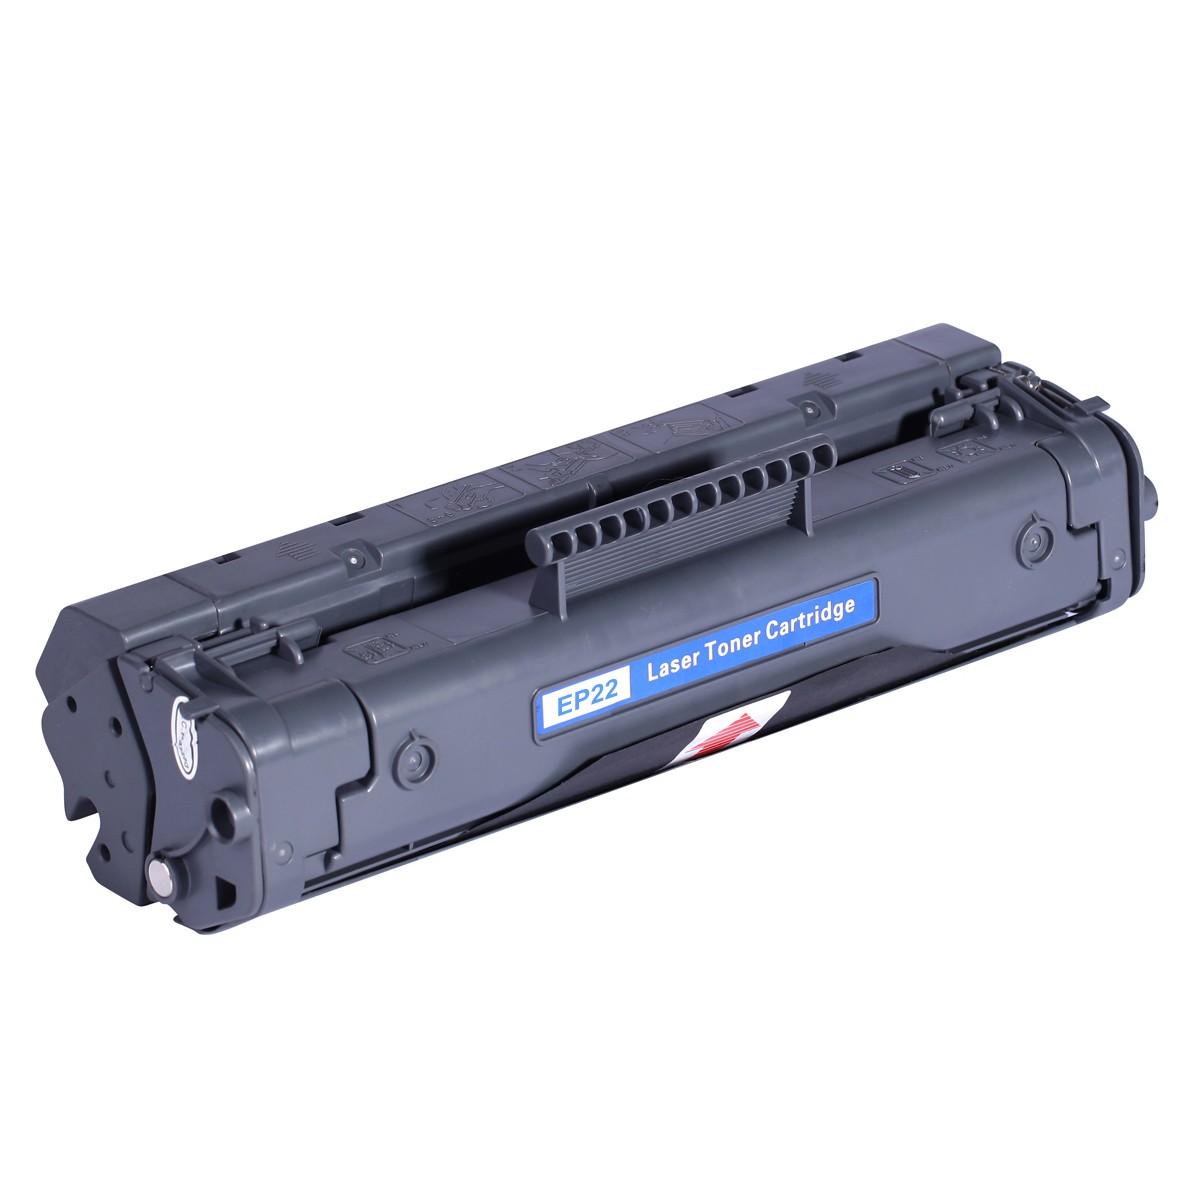 Ep22 Toner Cartridge Compatible For Canon Ep 22 Laser Shot Lbp1120 Cadtrige 810 800 Ebay